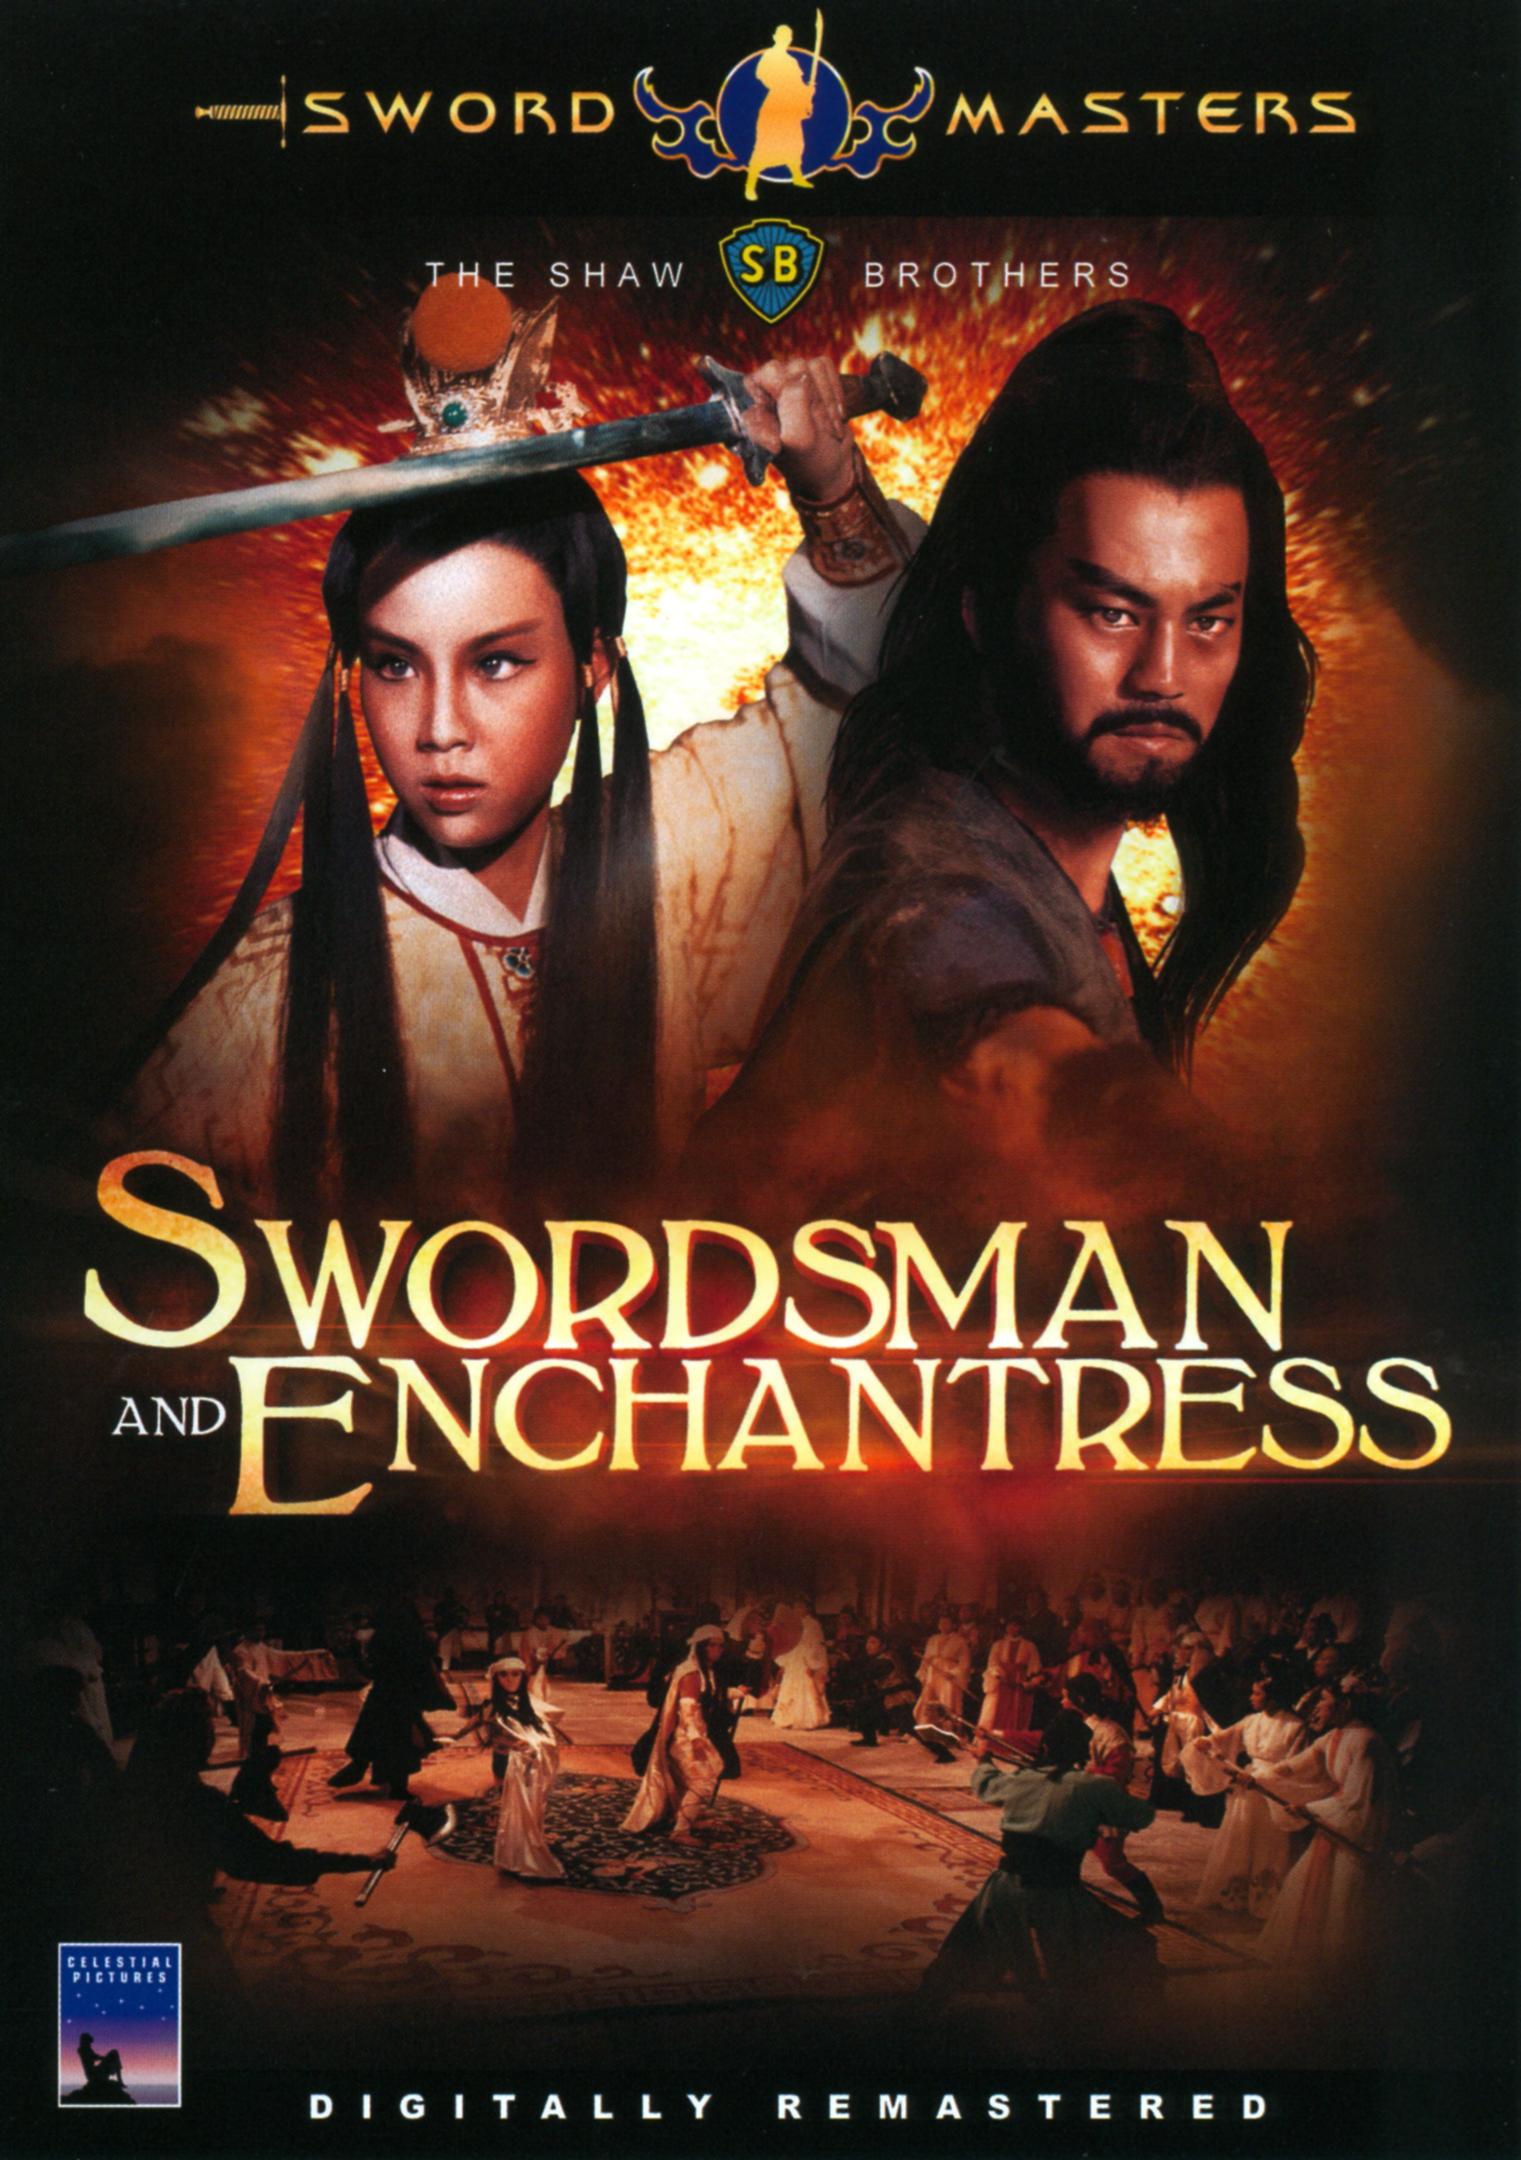 Swordsman & Enchantress